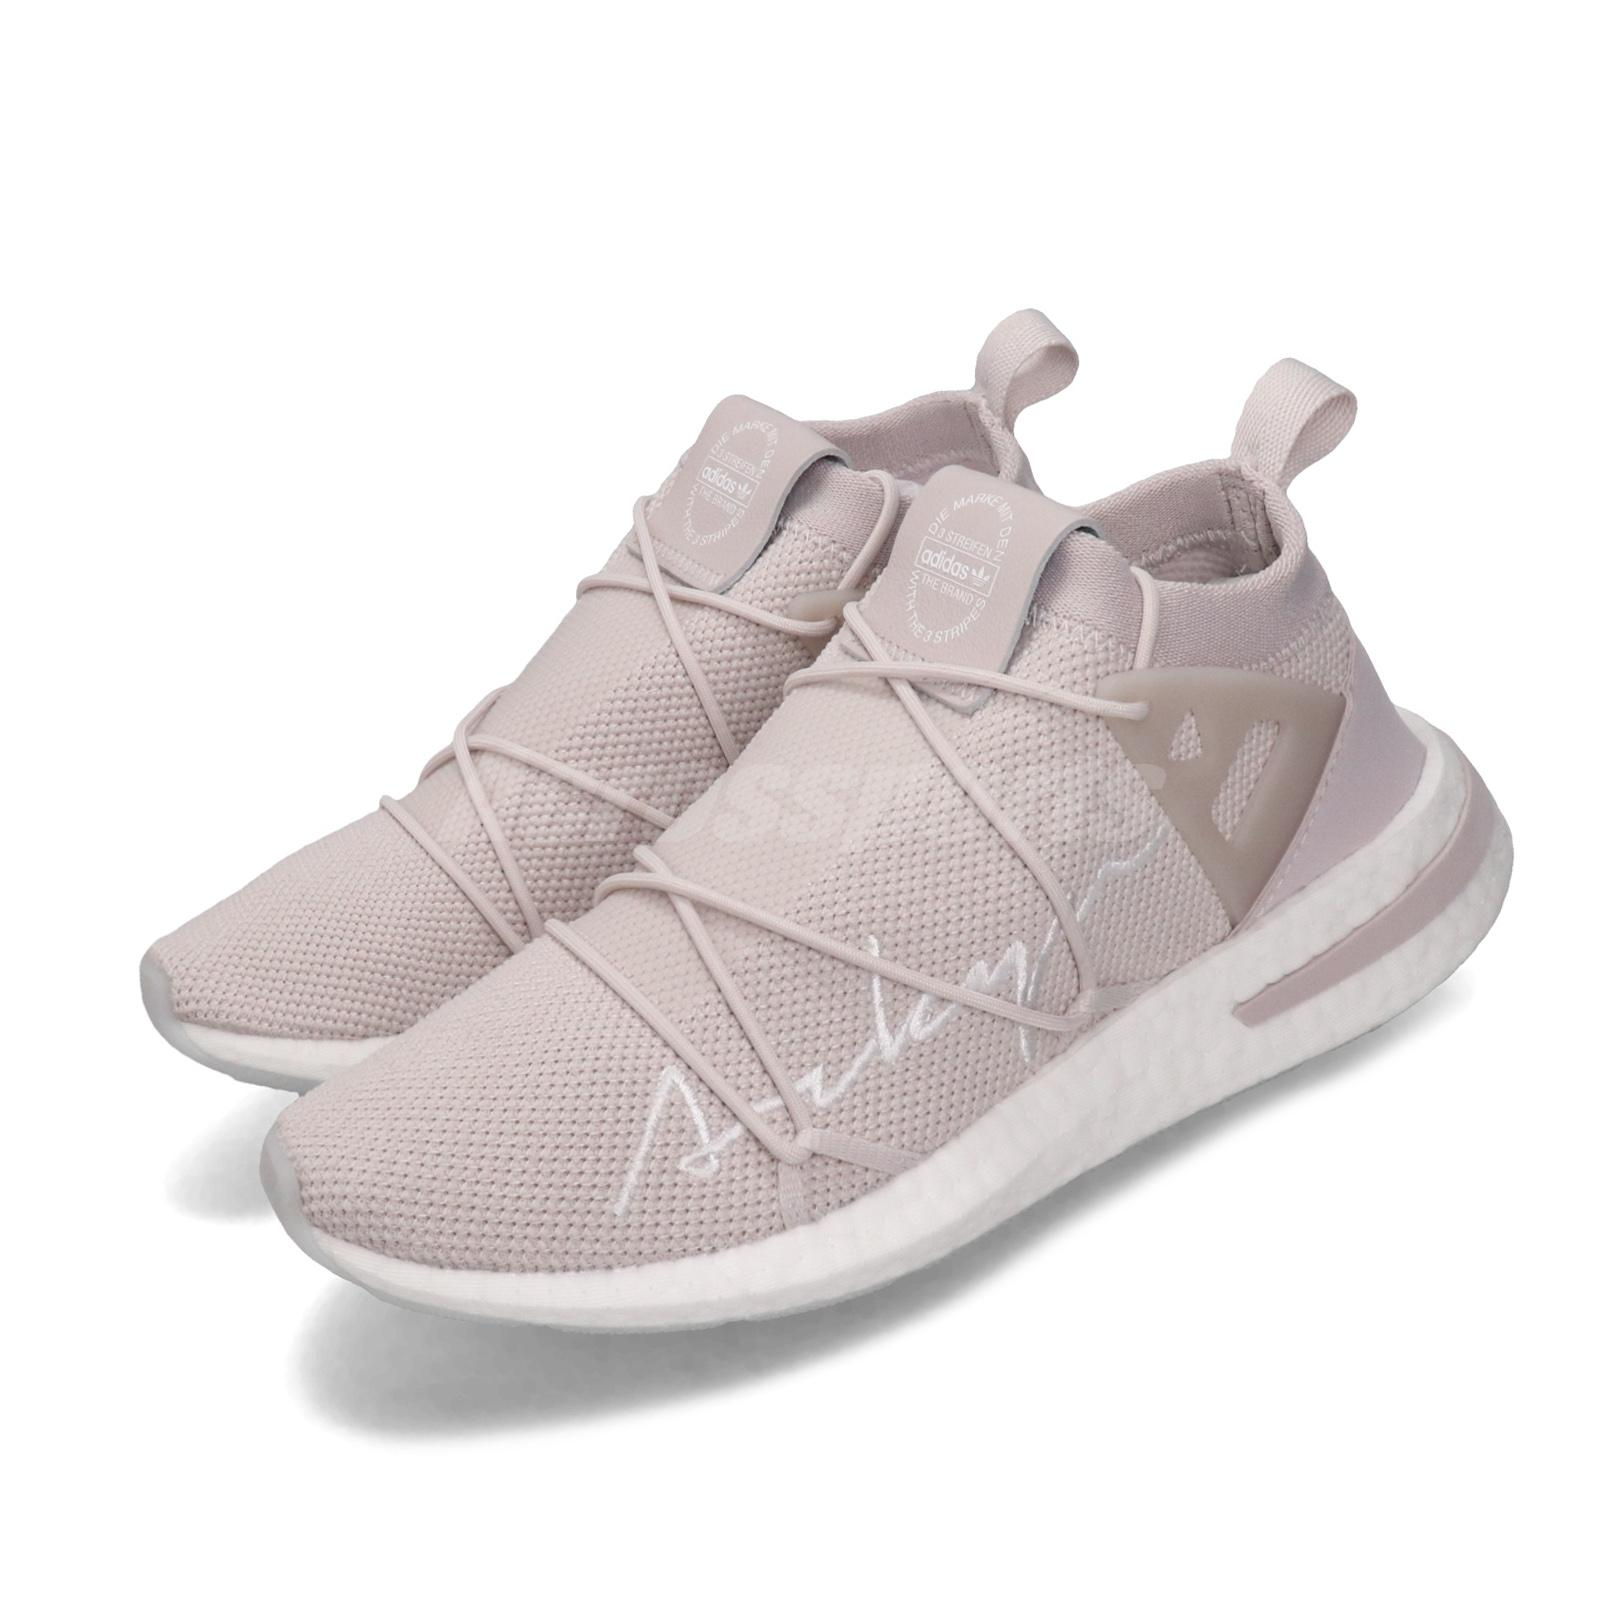 Adidas Originals Arkyn Knit W Boost Ice Purple White Wo